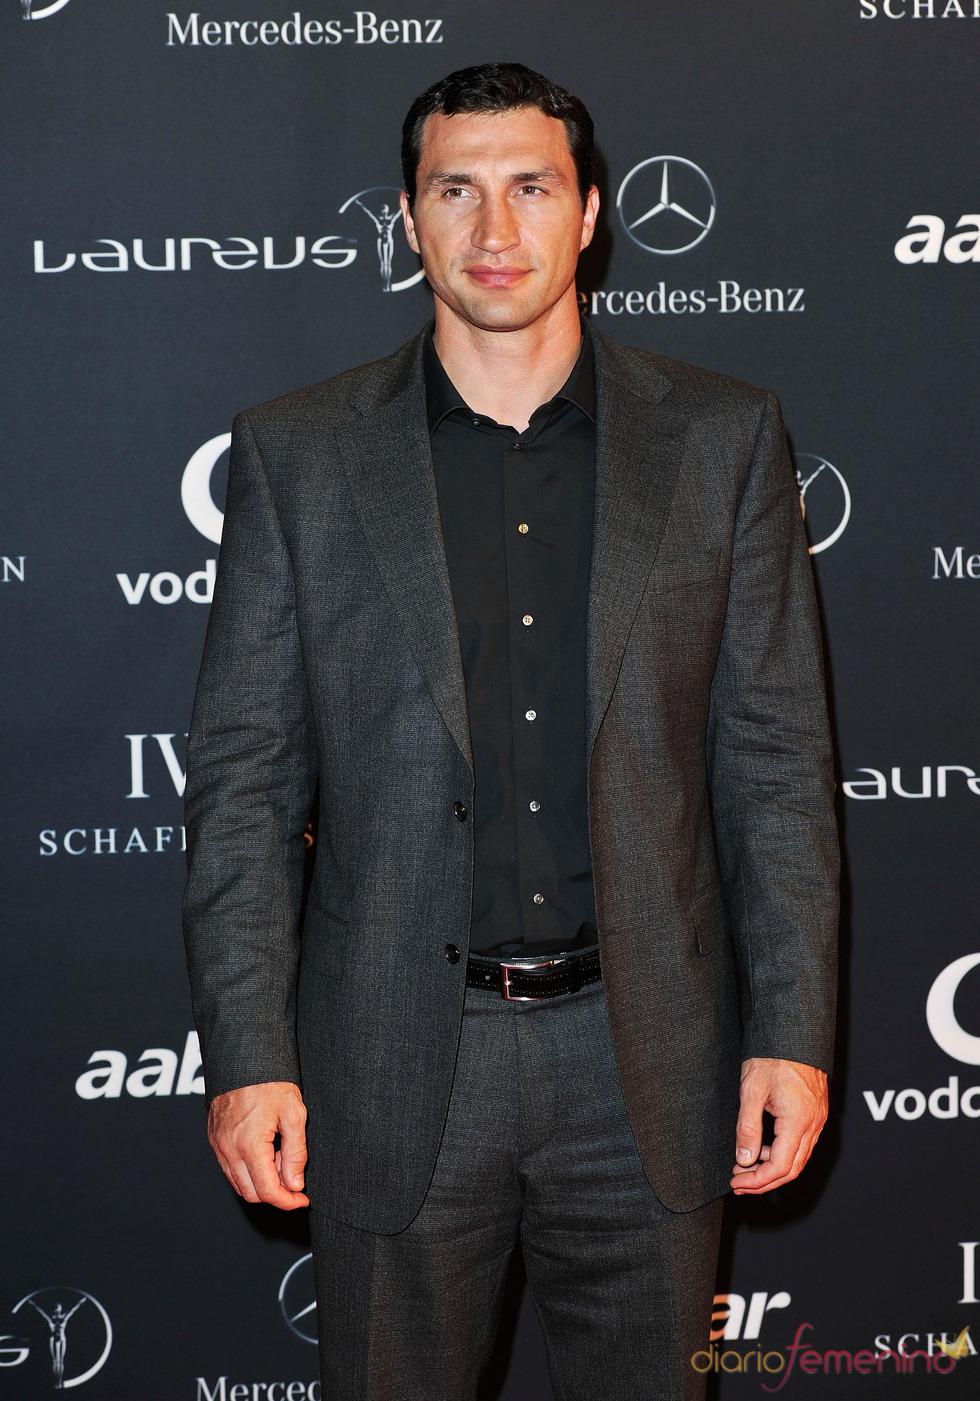 El boxeador Vladimir Klitschko en la Laureus Welcome Party